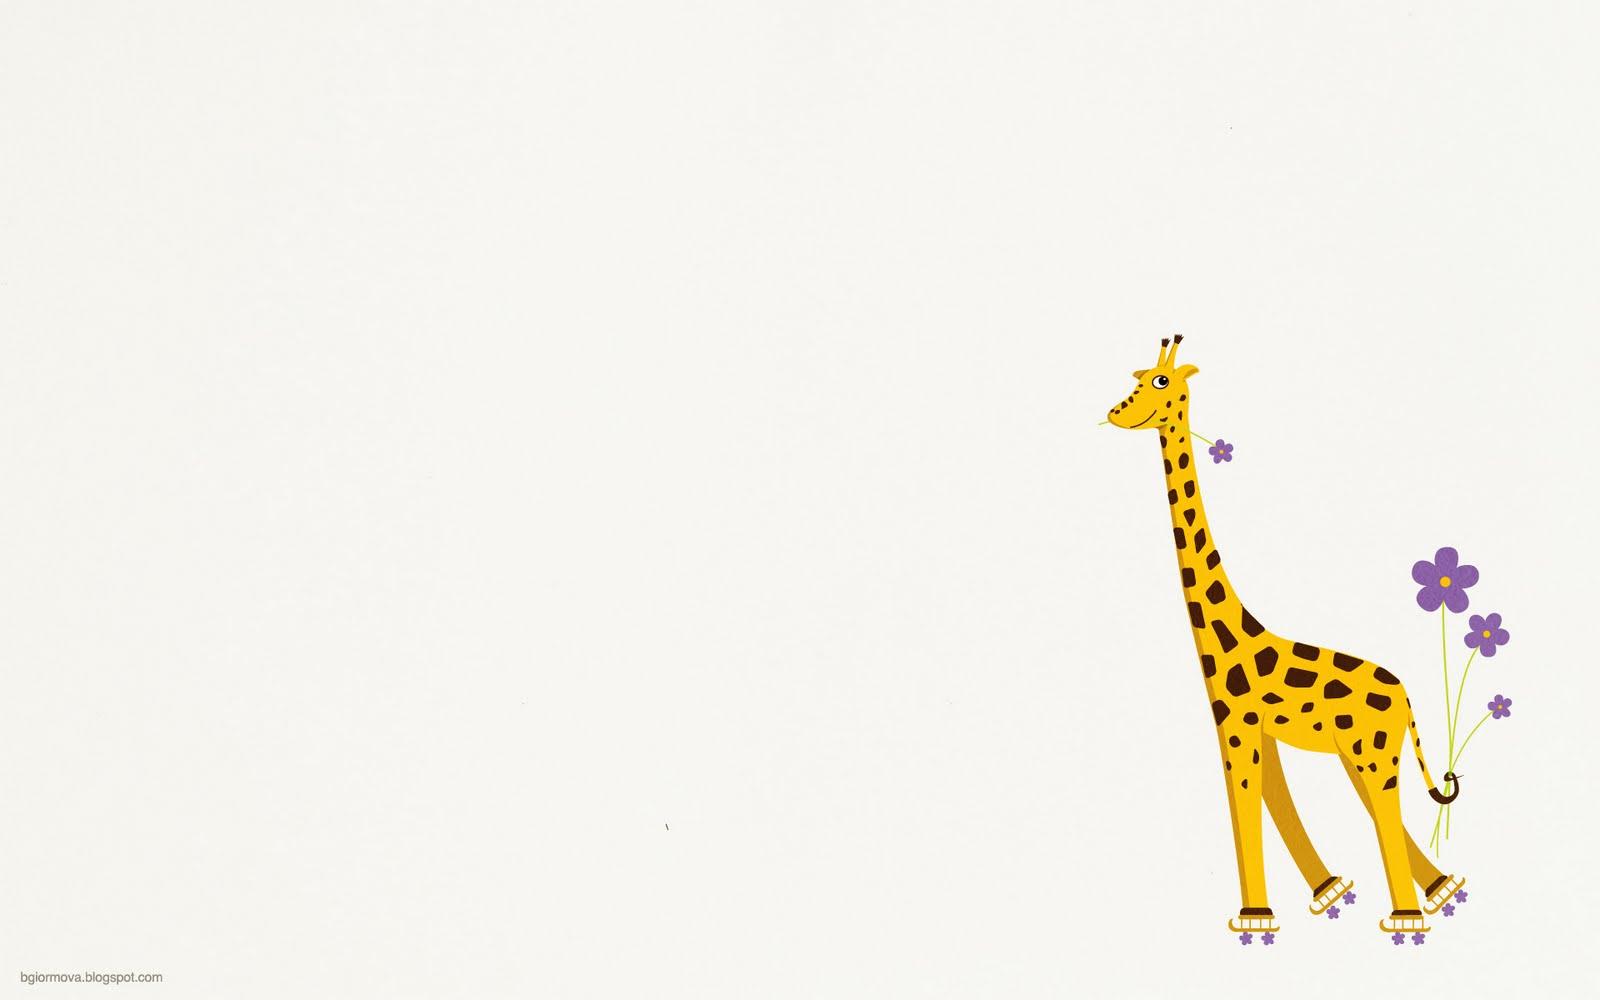 Cool Wallpaper Colorful Giraffe - uA2M7b  2018_97142 .jpg